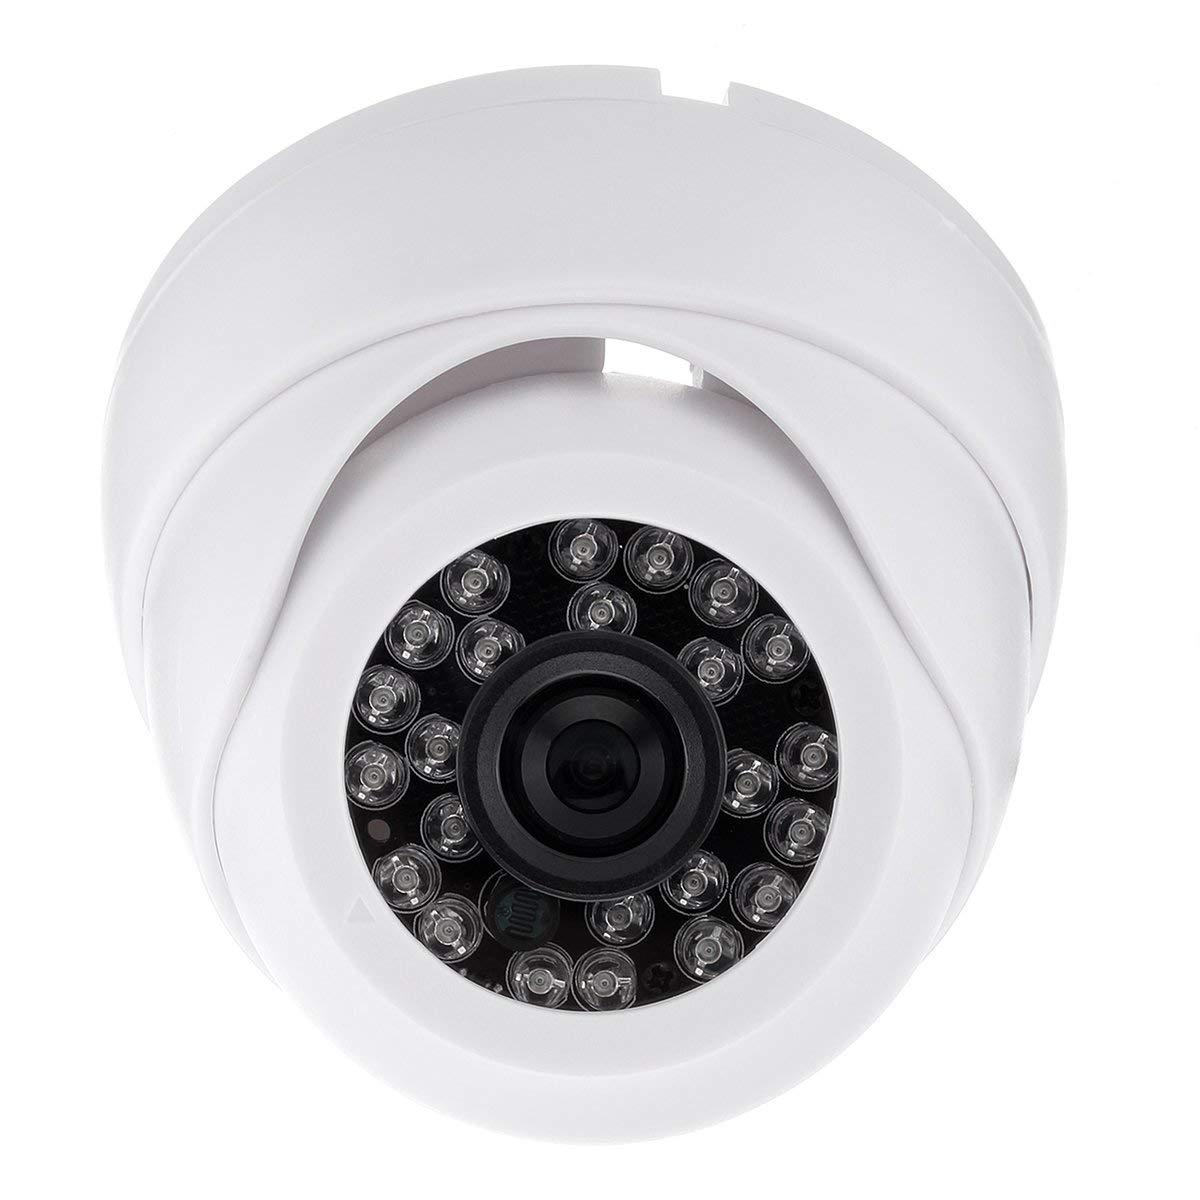 HD 1200TVL CCTV Surveillance Security Camera Outdoor IR Night Vision